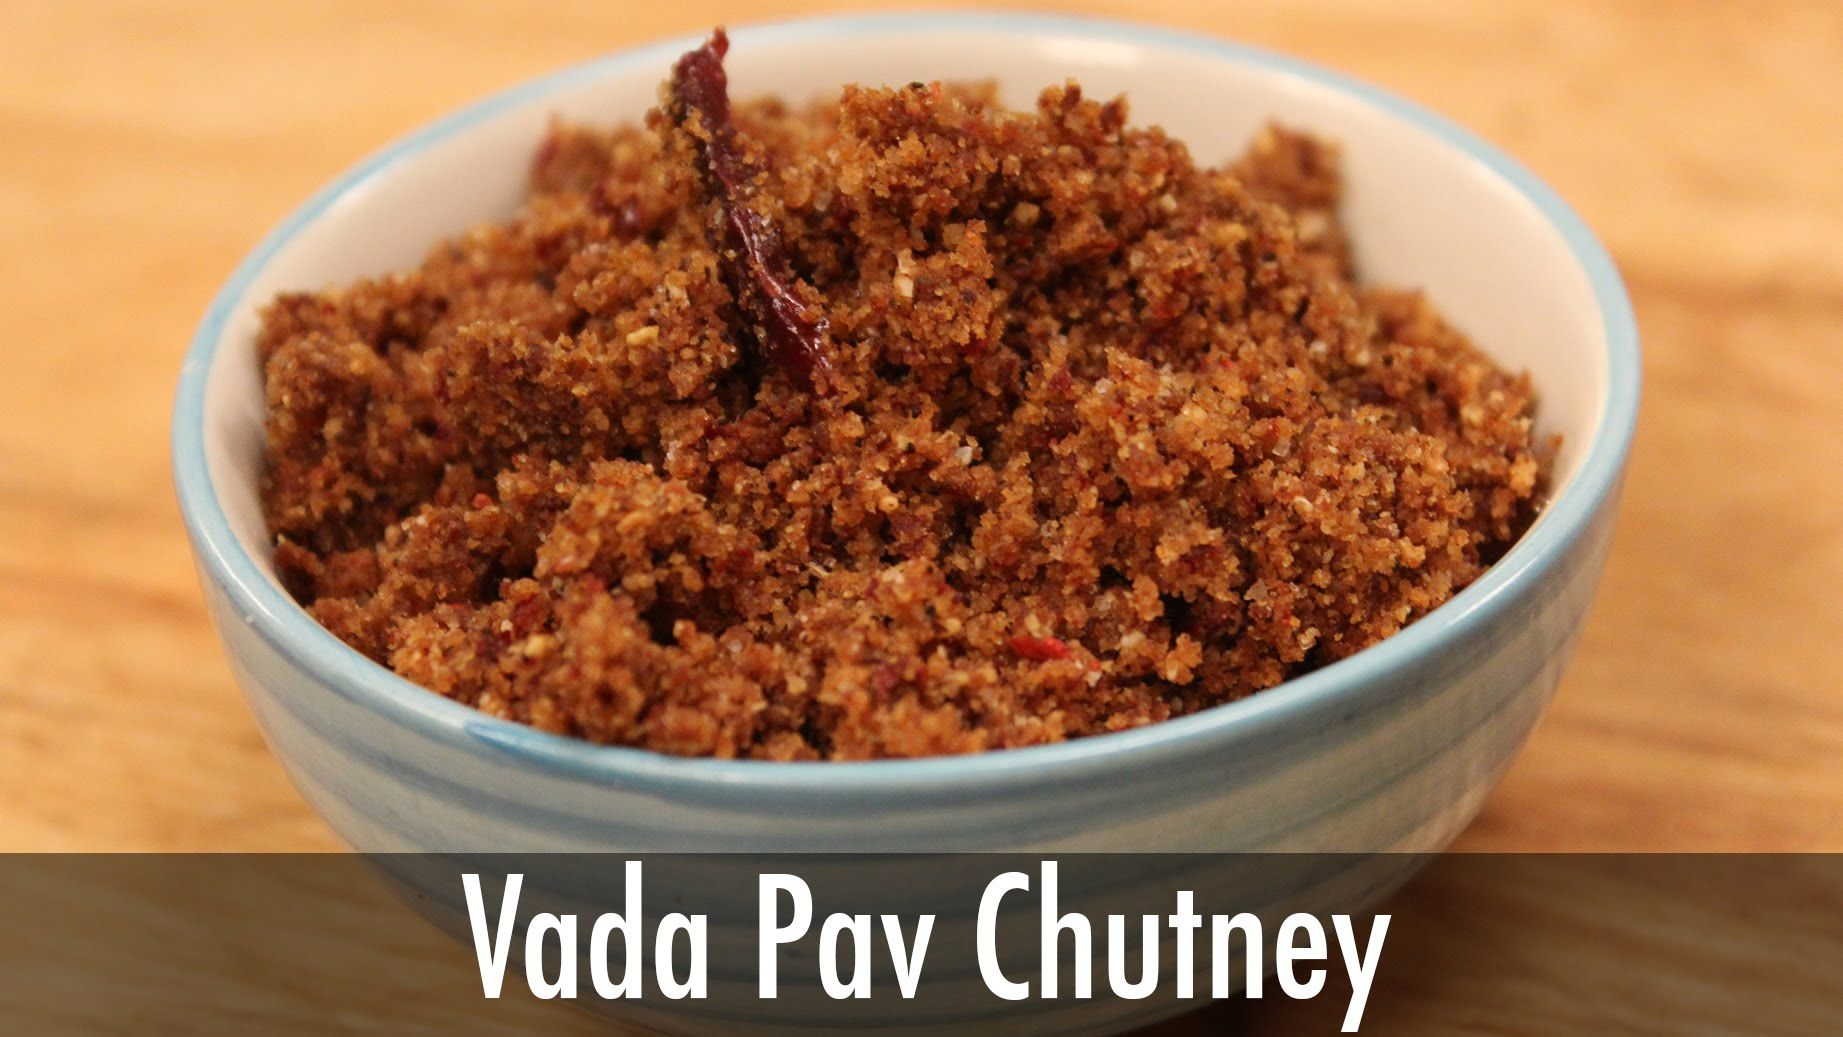 Vada pav chutney sanjeev kapoor khazana sanjeev kapoor recipes vada pav chutney sanjeev kapoor khazana forumfinder Gallery